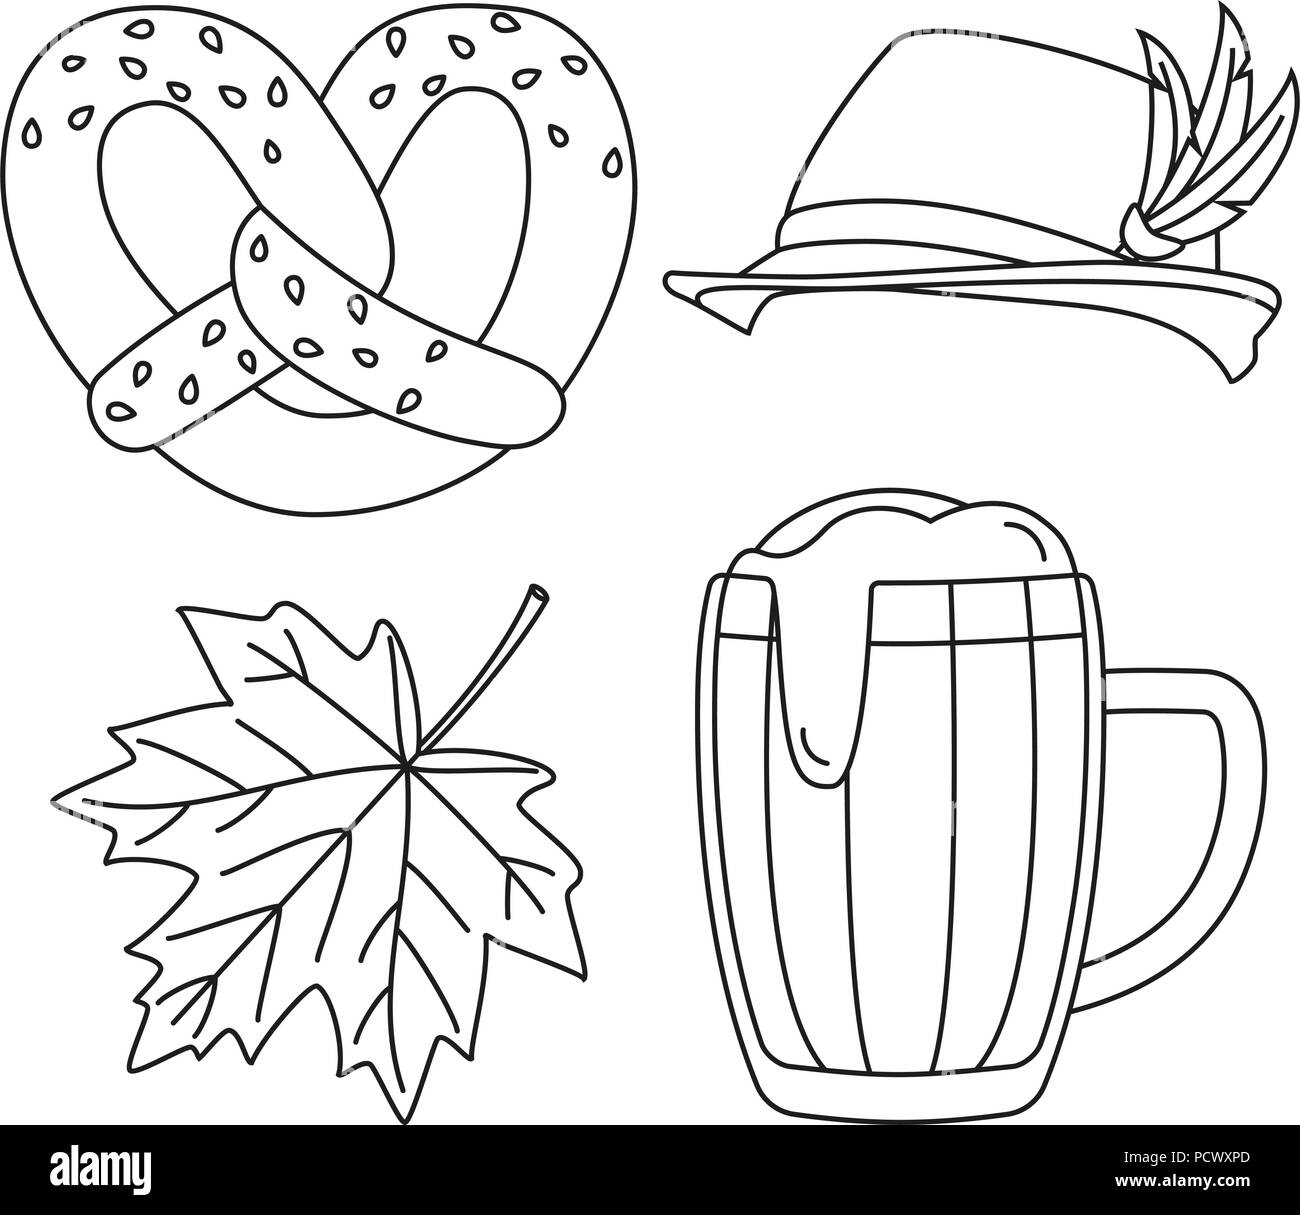 Line art black and white oktoberfest elements set - Stock Vector